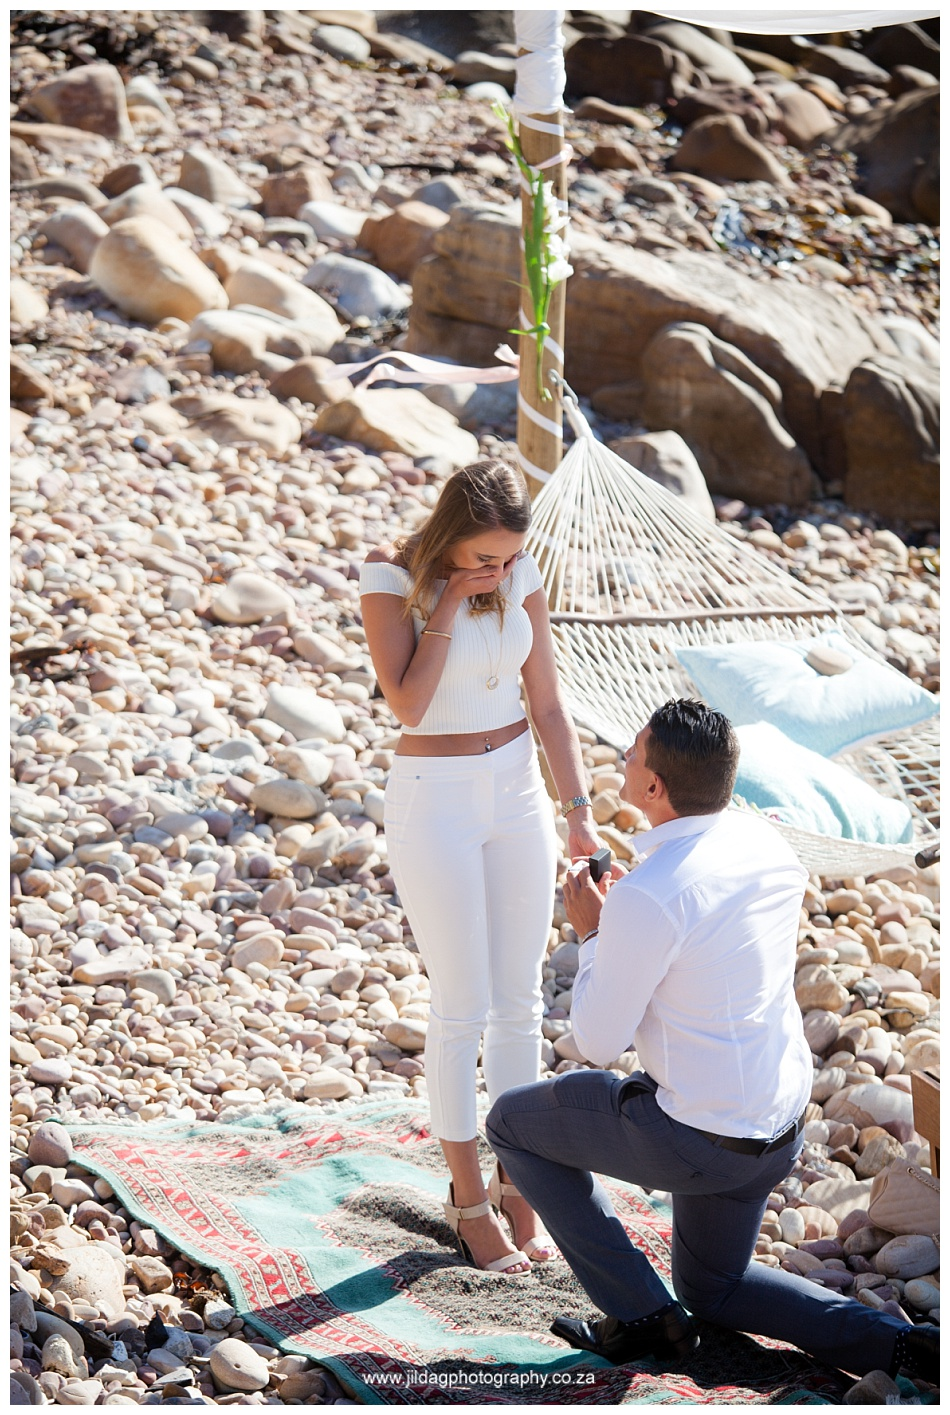 Jilda-G-Photography-Tintswalo-beach-proposal_0817